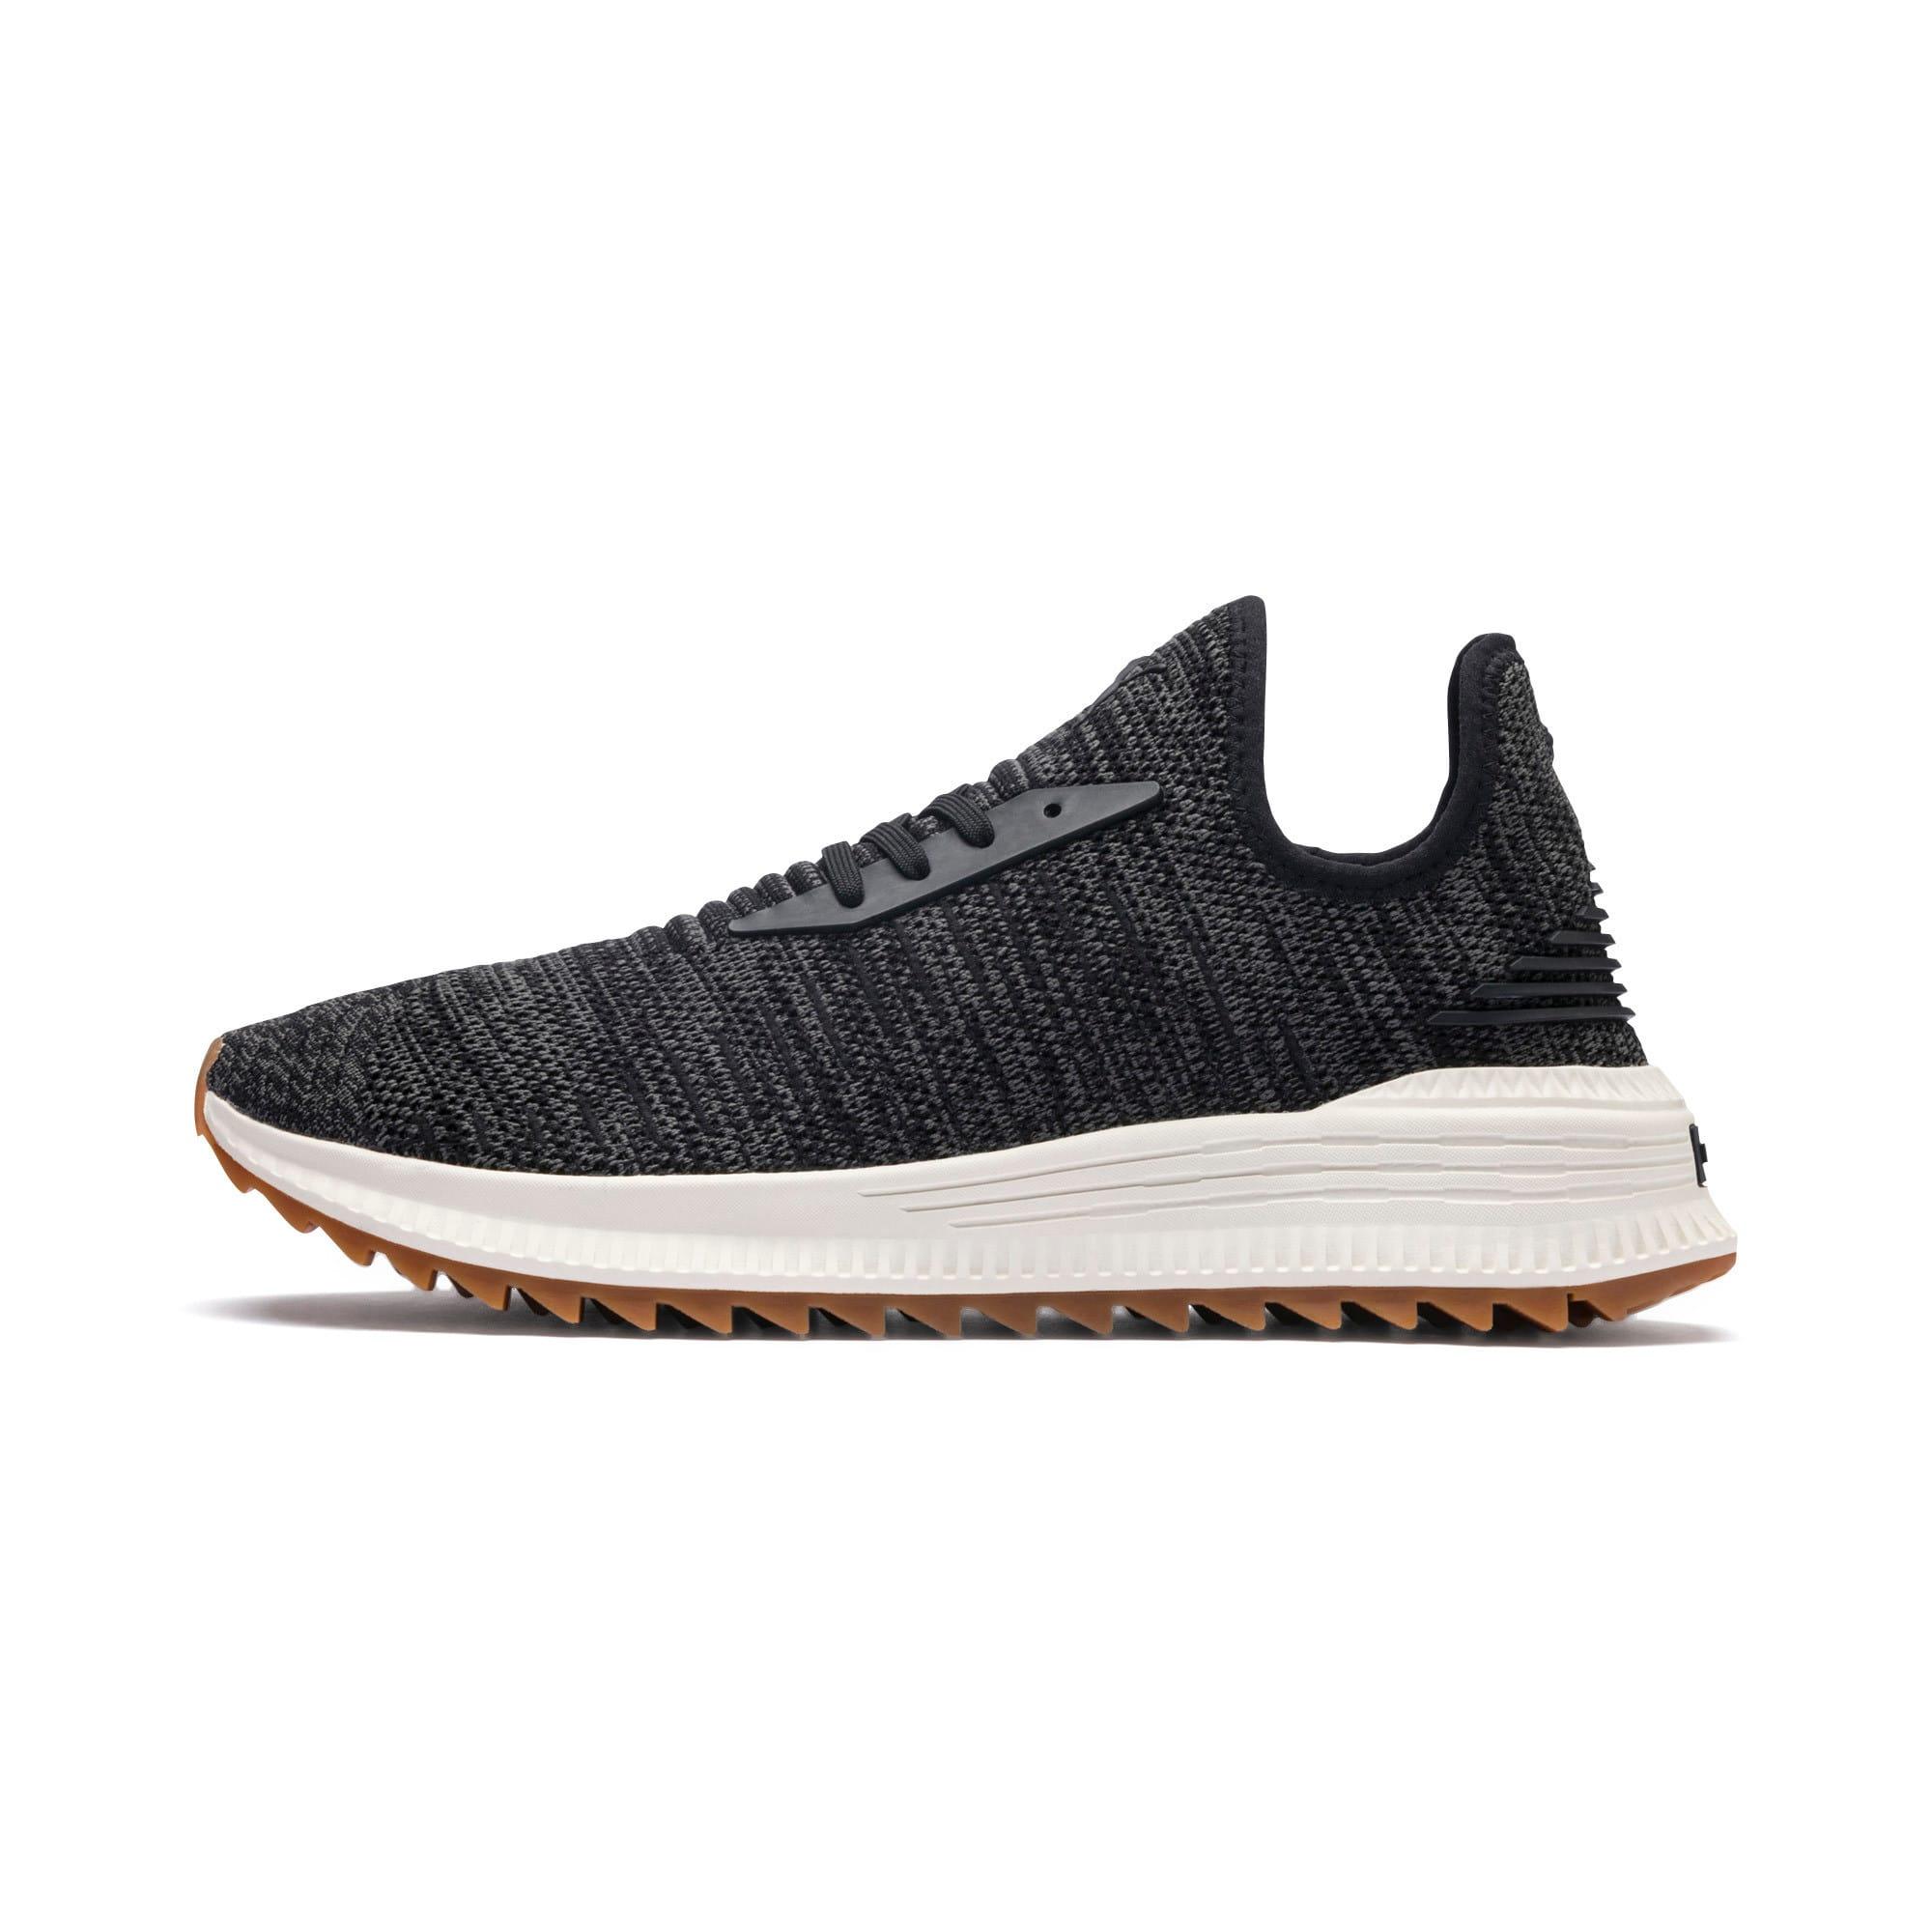 Thumbnail 1 of AVID Repellent Sneakers, Puma Black-Dark Shadow, medium